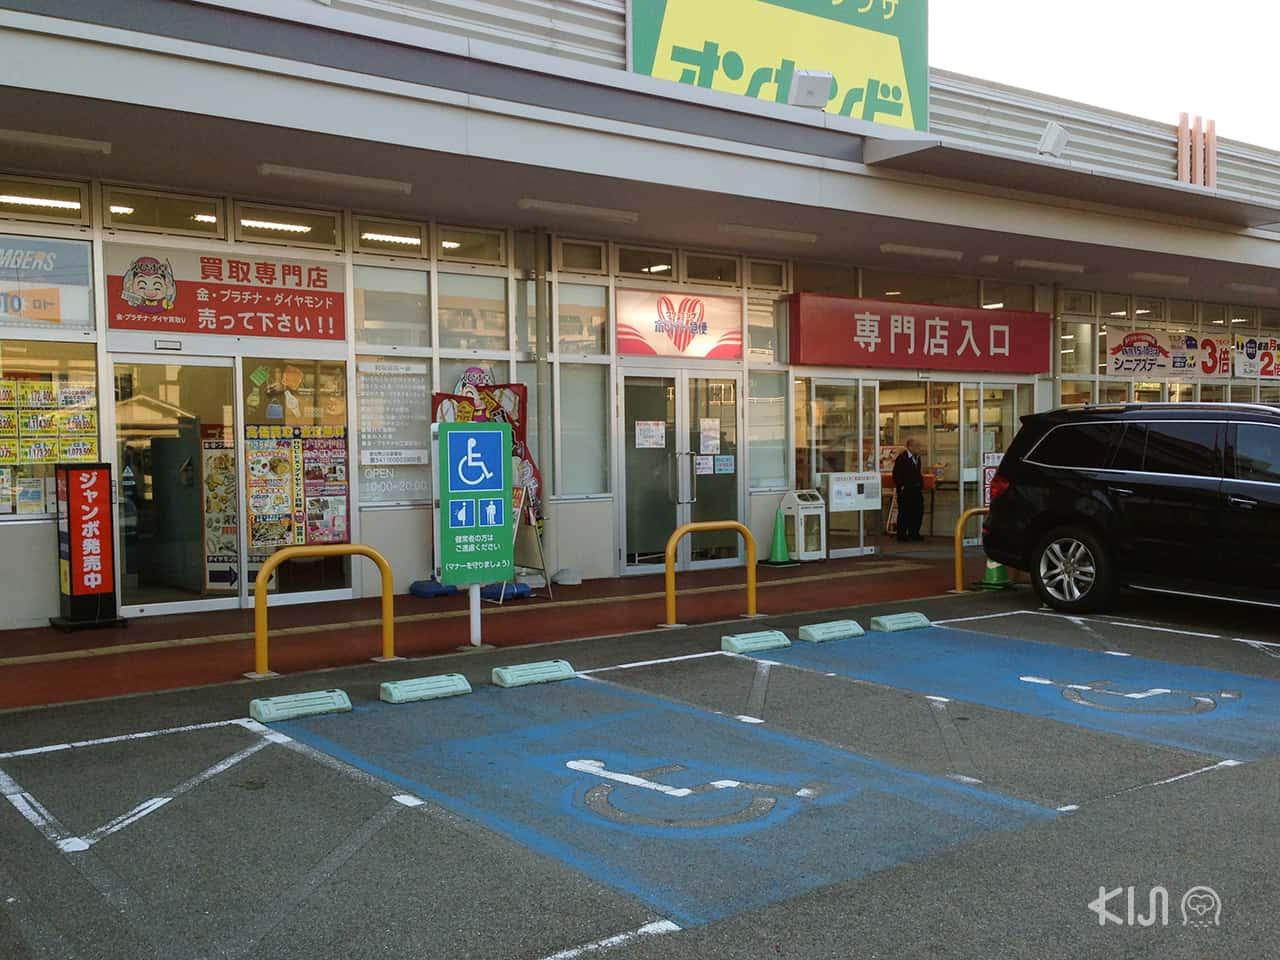 Universal Design ในญี่ปุ่น (japan) - Priority Parking